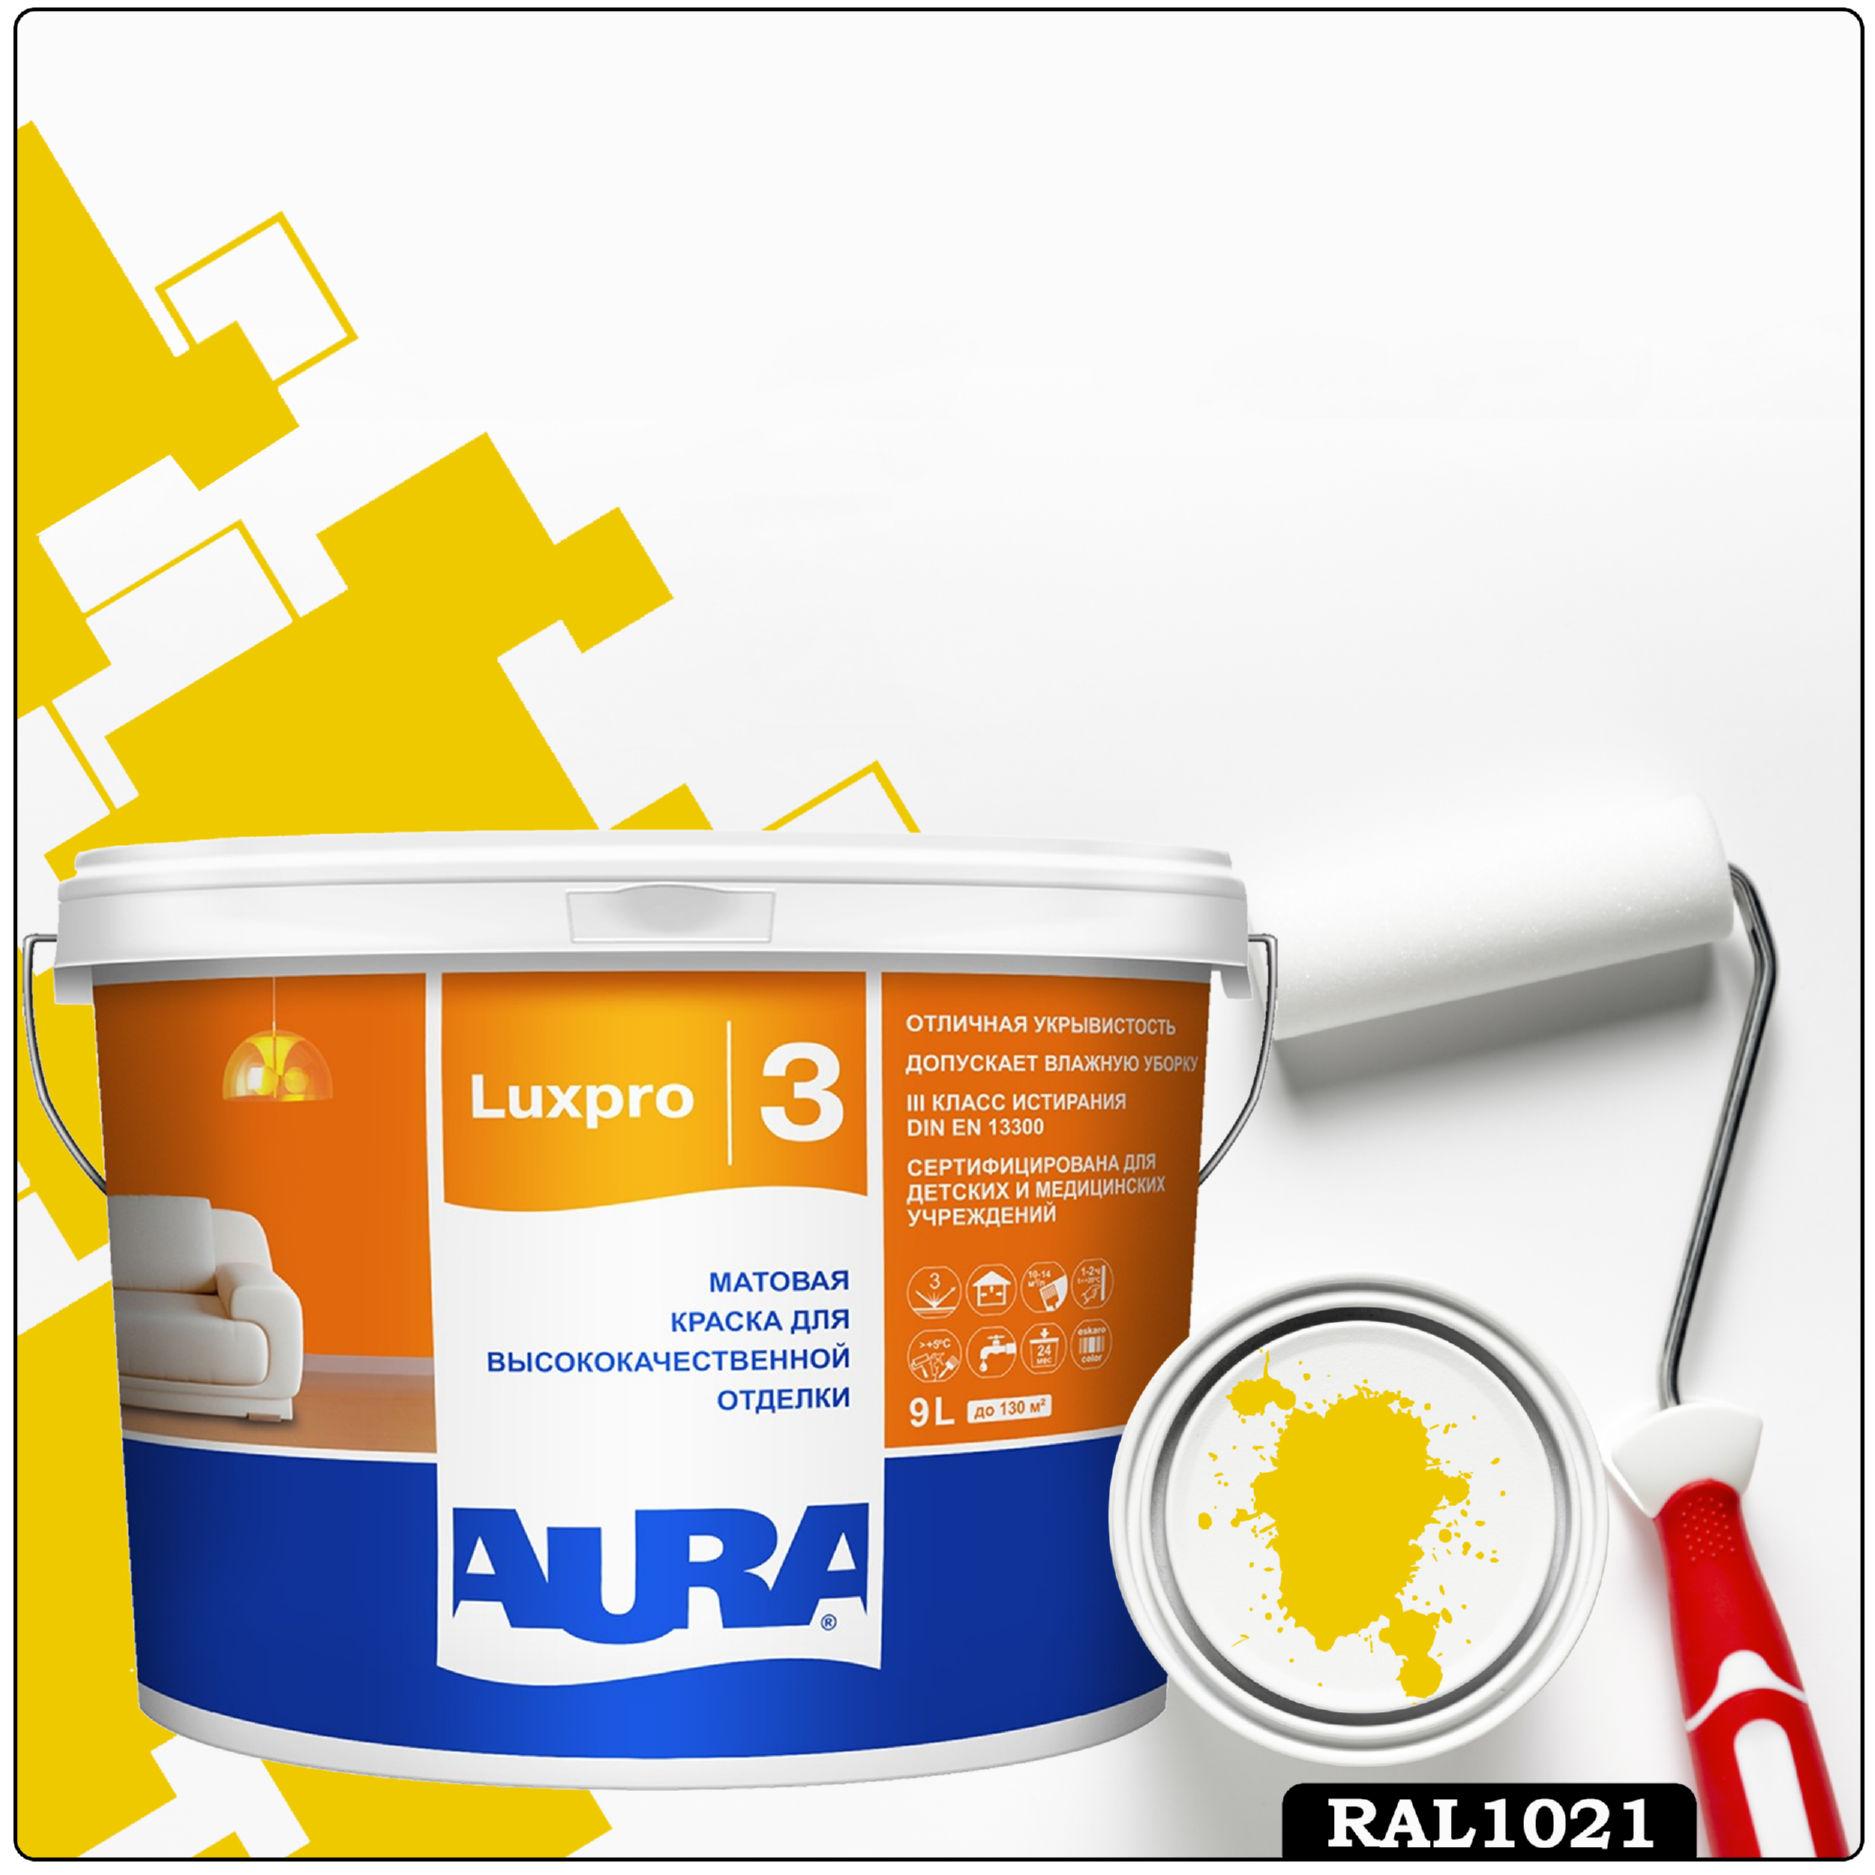 Фото 19 - Краска Aura LuxPRO 3, RAL 1021 Рапсово-жёлтый, латексная, шелково-матовая, интерьерная, 9л, Аура.